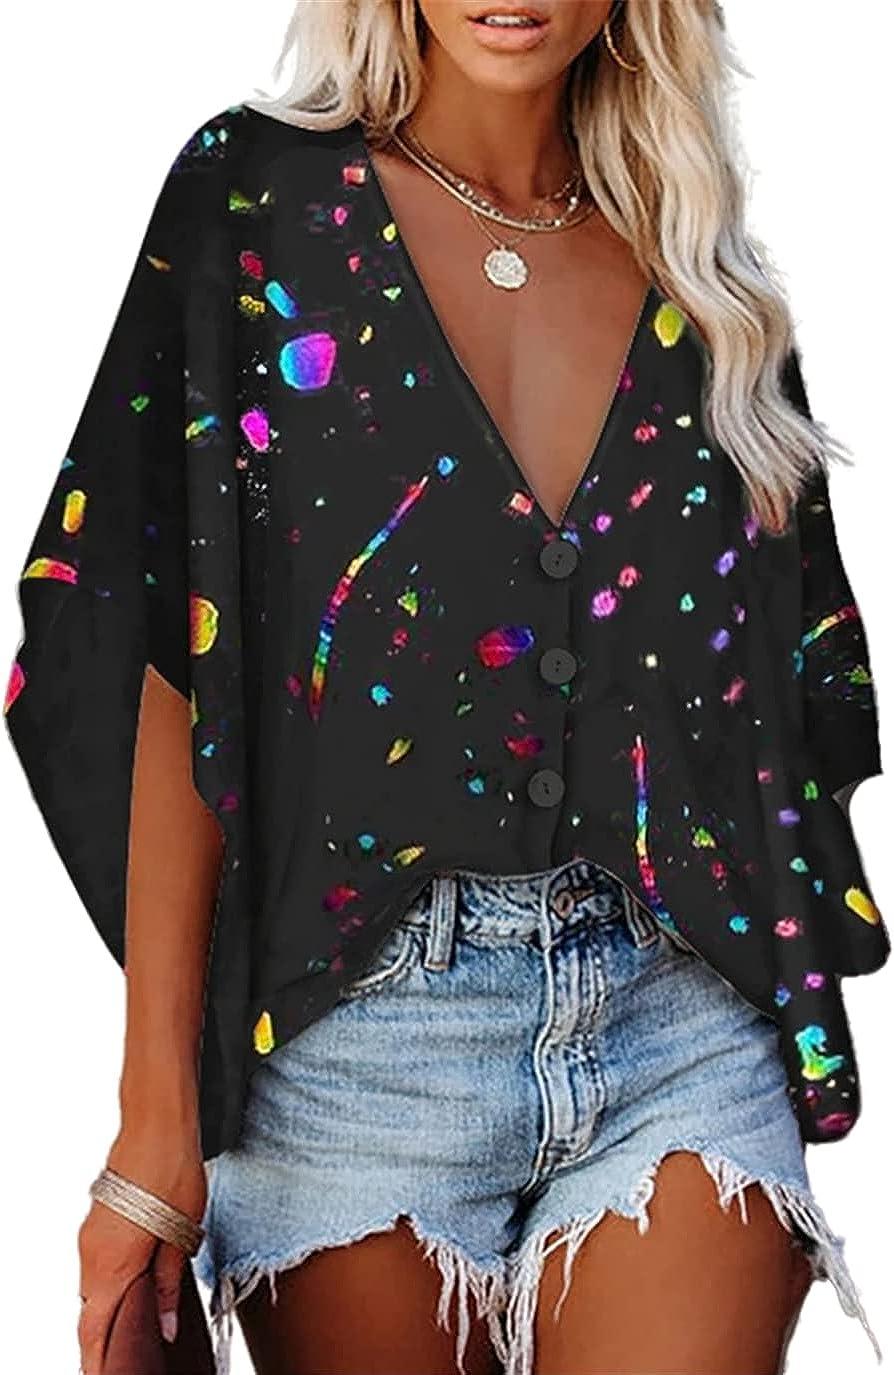 FRMUIC Women's Deep V Necktie Button Bat Sleeve T Shirt Graffiti Print Women Shirt Sexy Fashion Previous Top